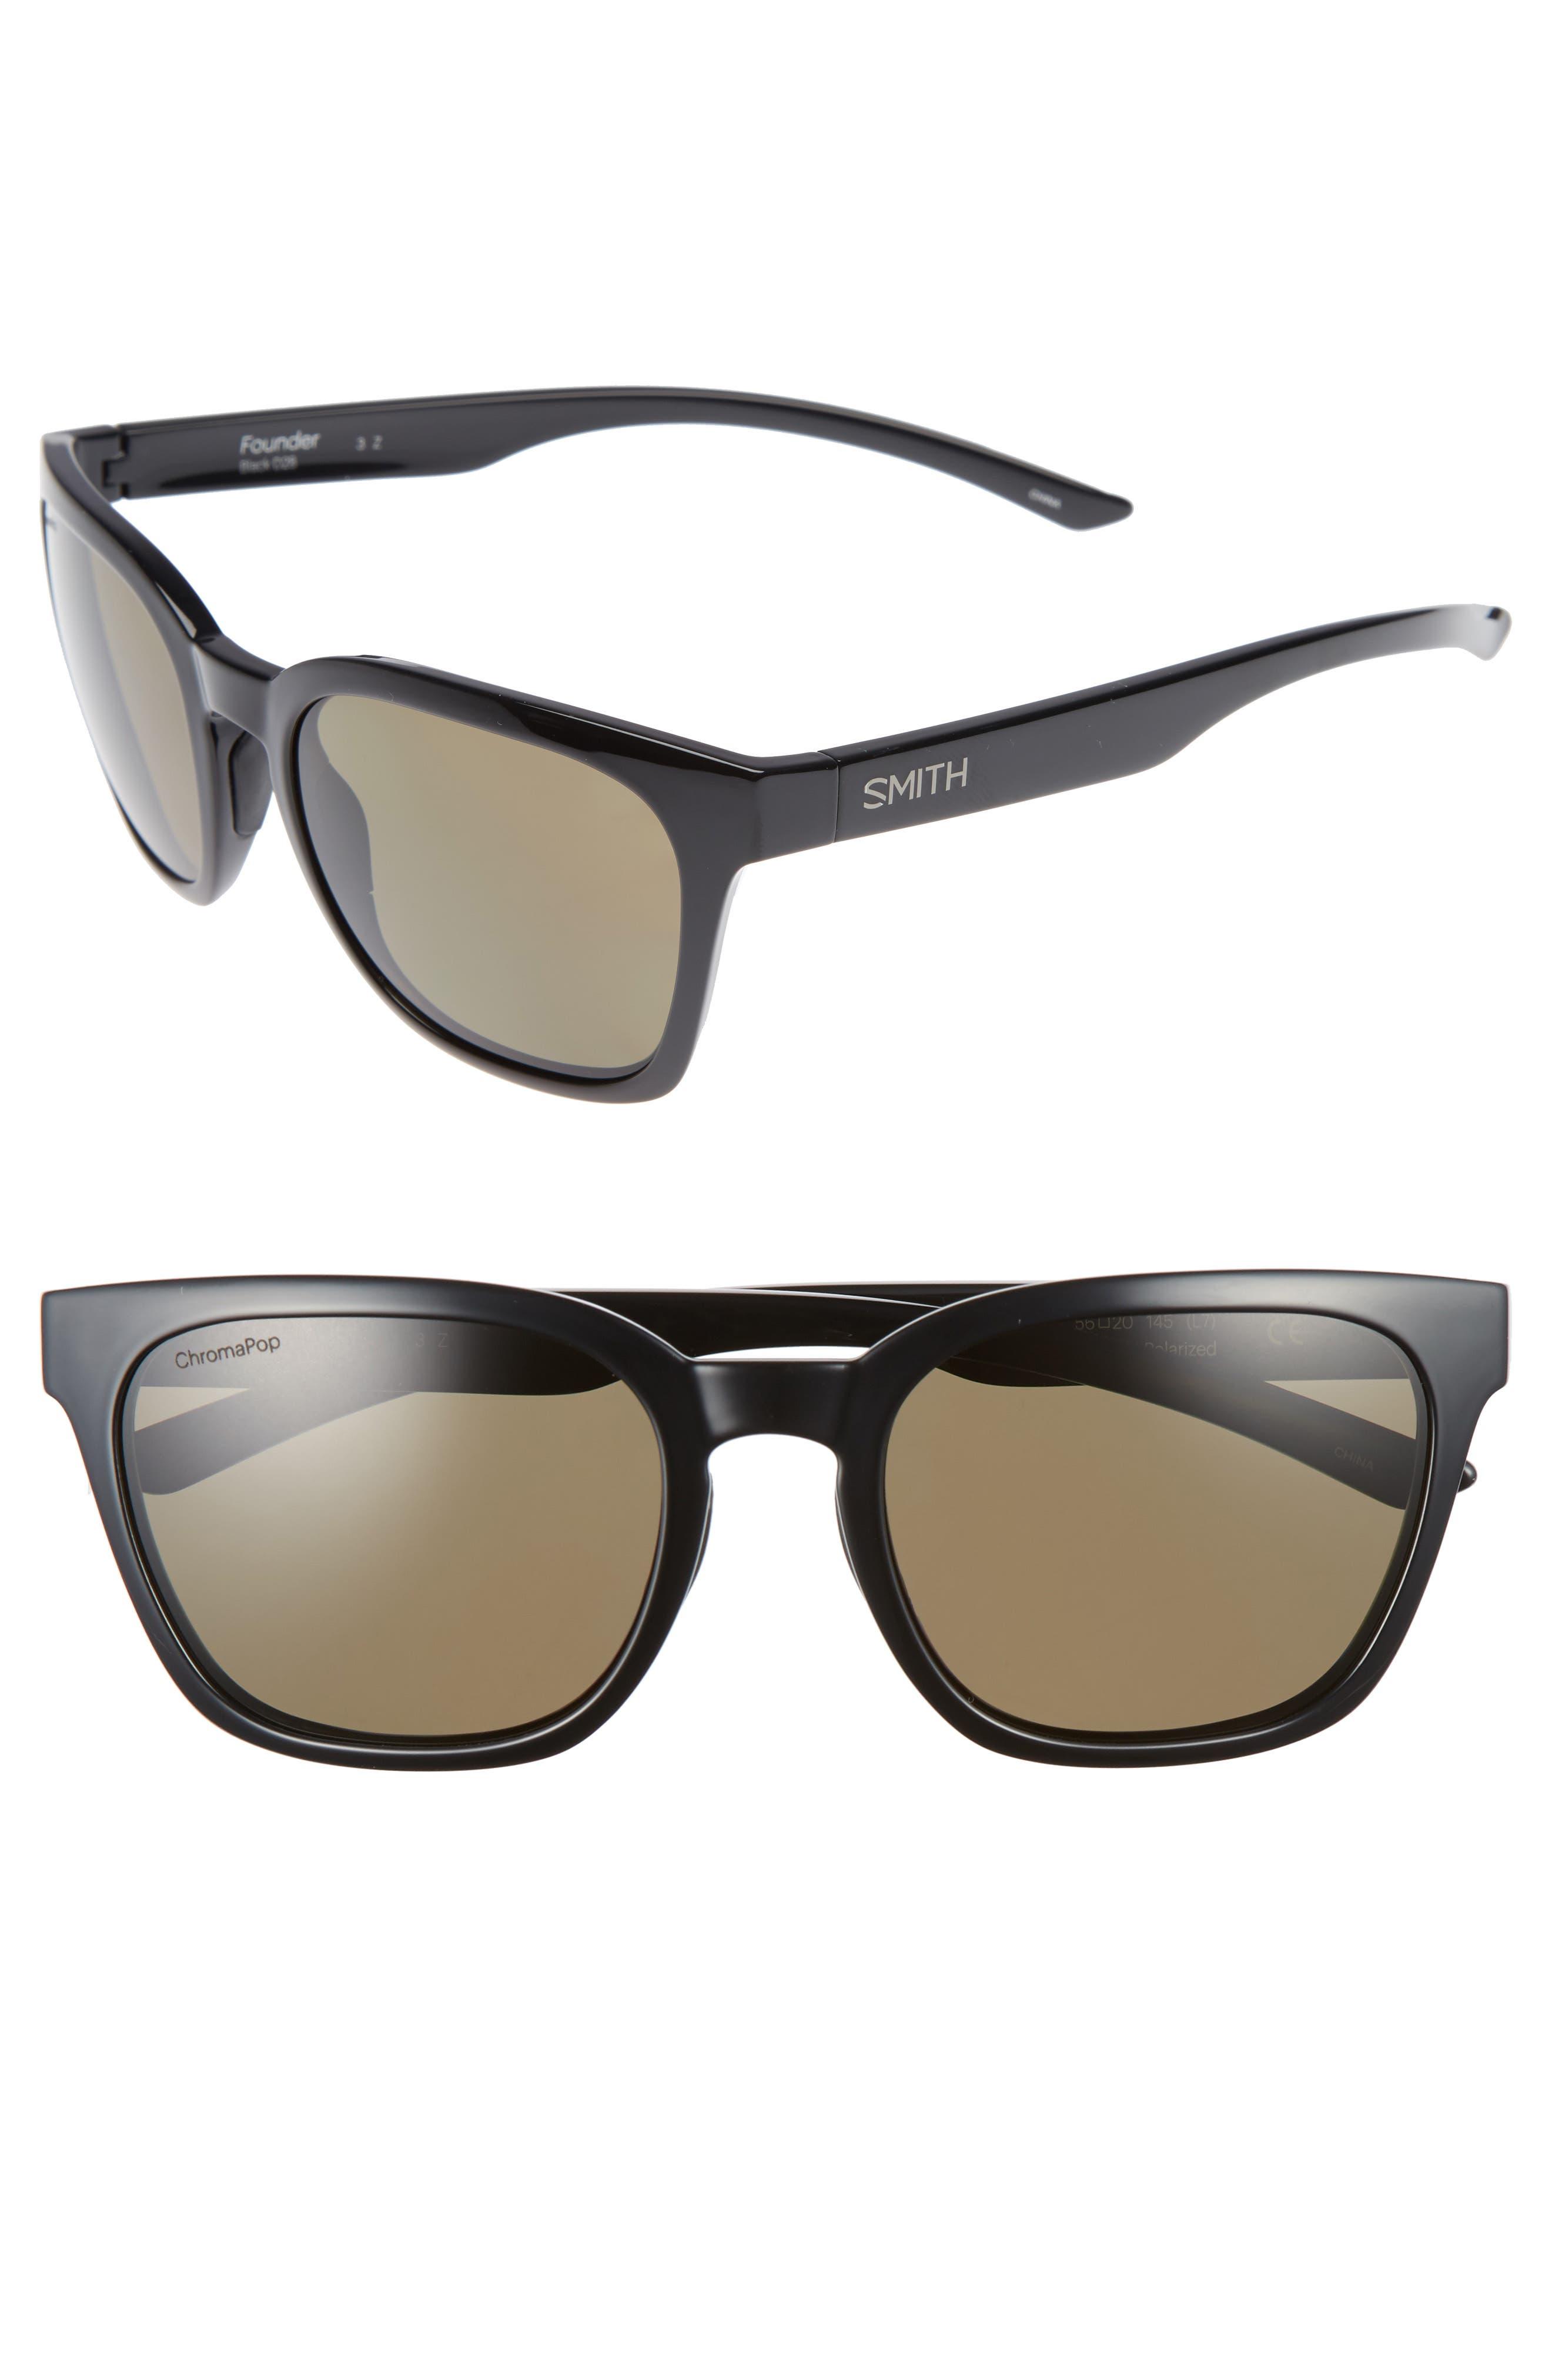 Main Image - Smith Founder 55mm ChromaPop Polarized Sunglasses